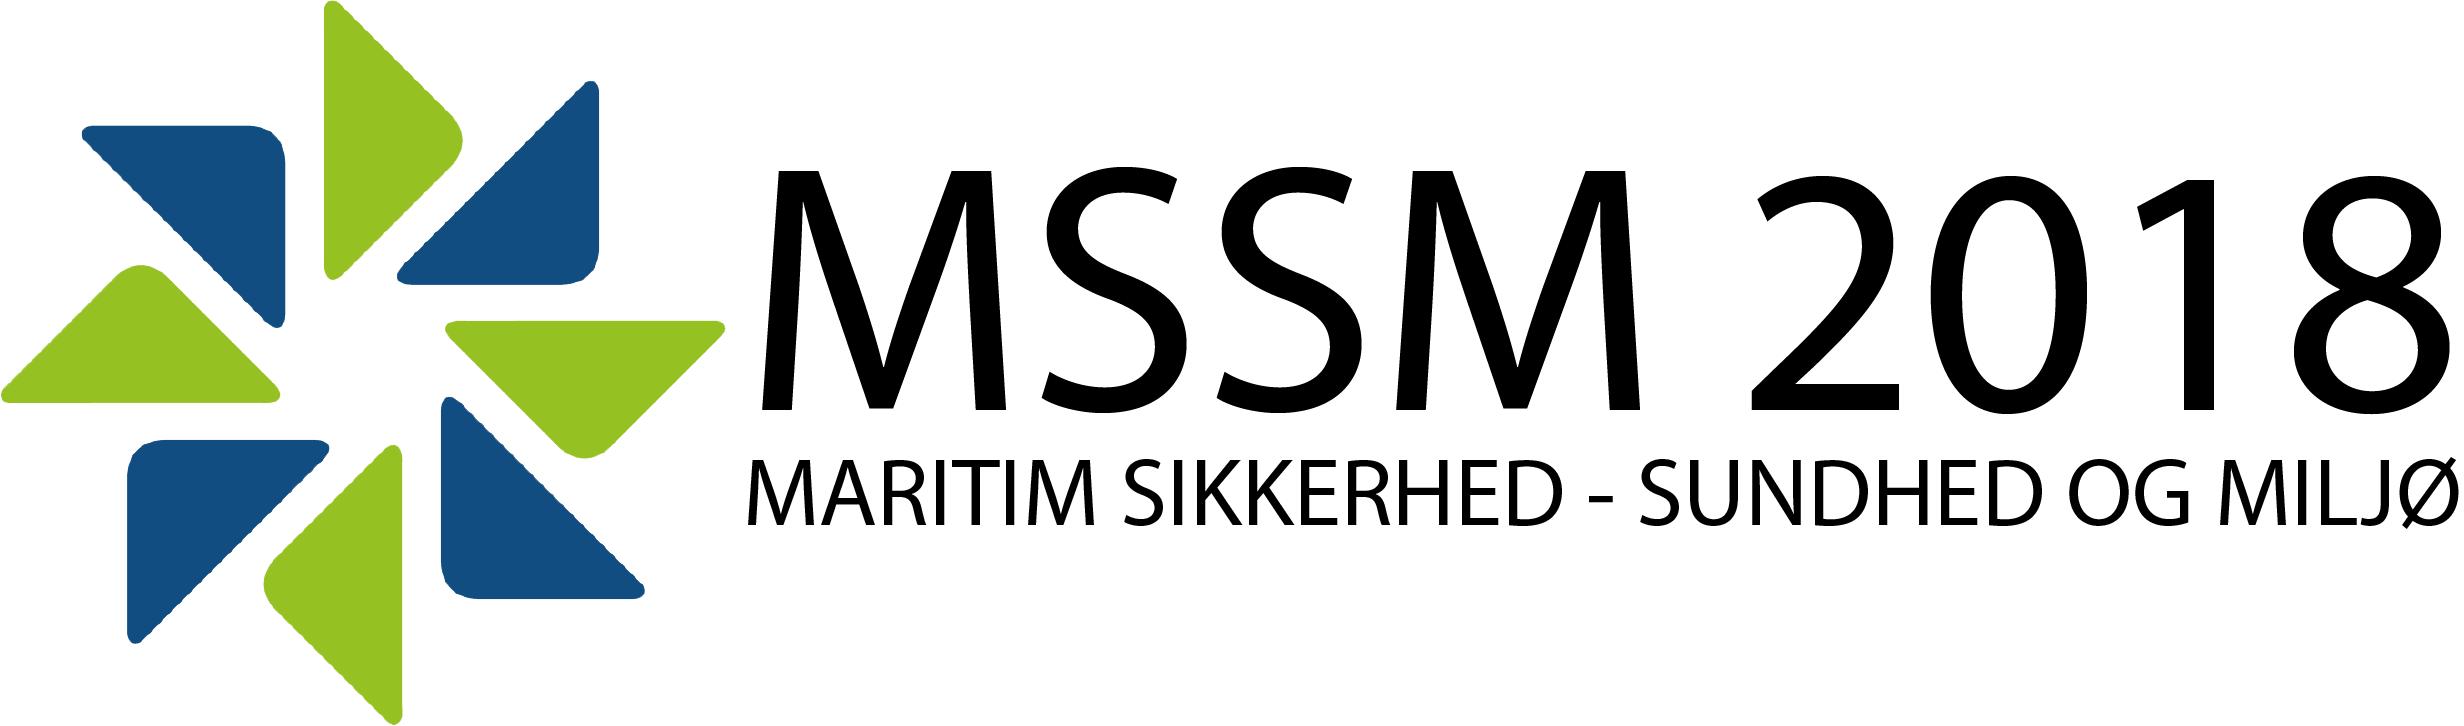 MSSM_logo_mdcfarver.white.png